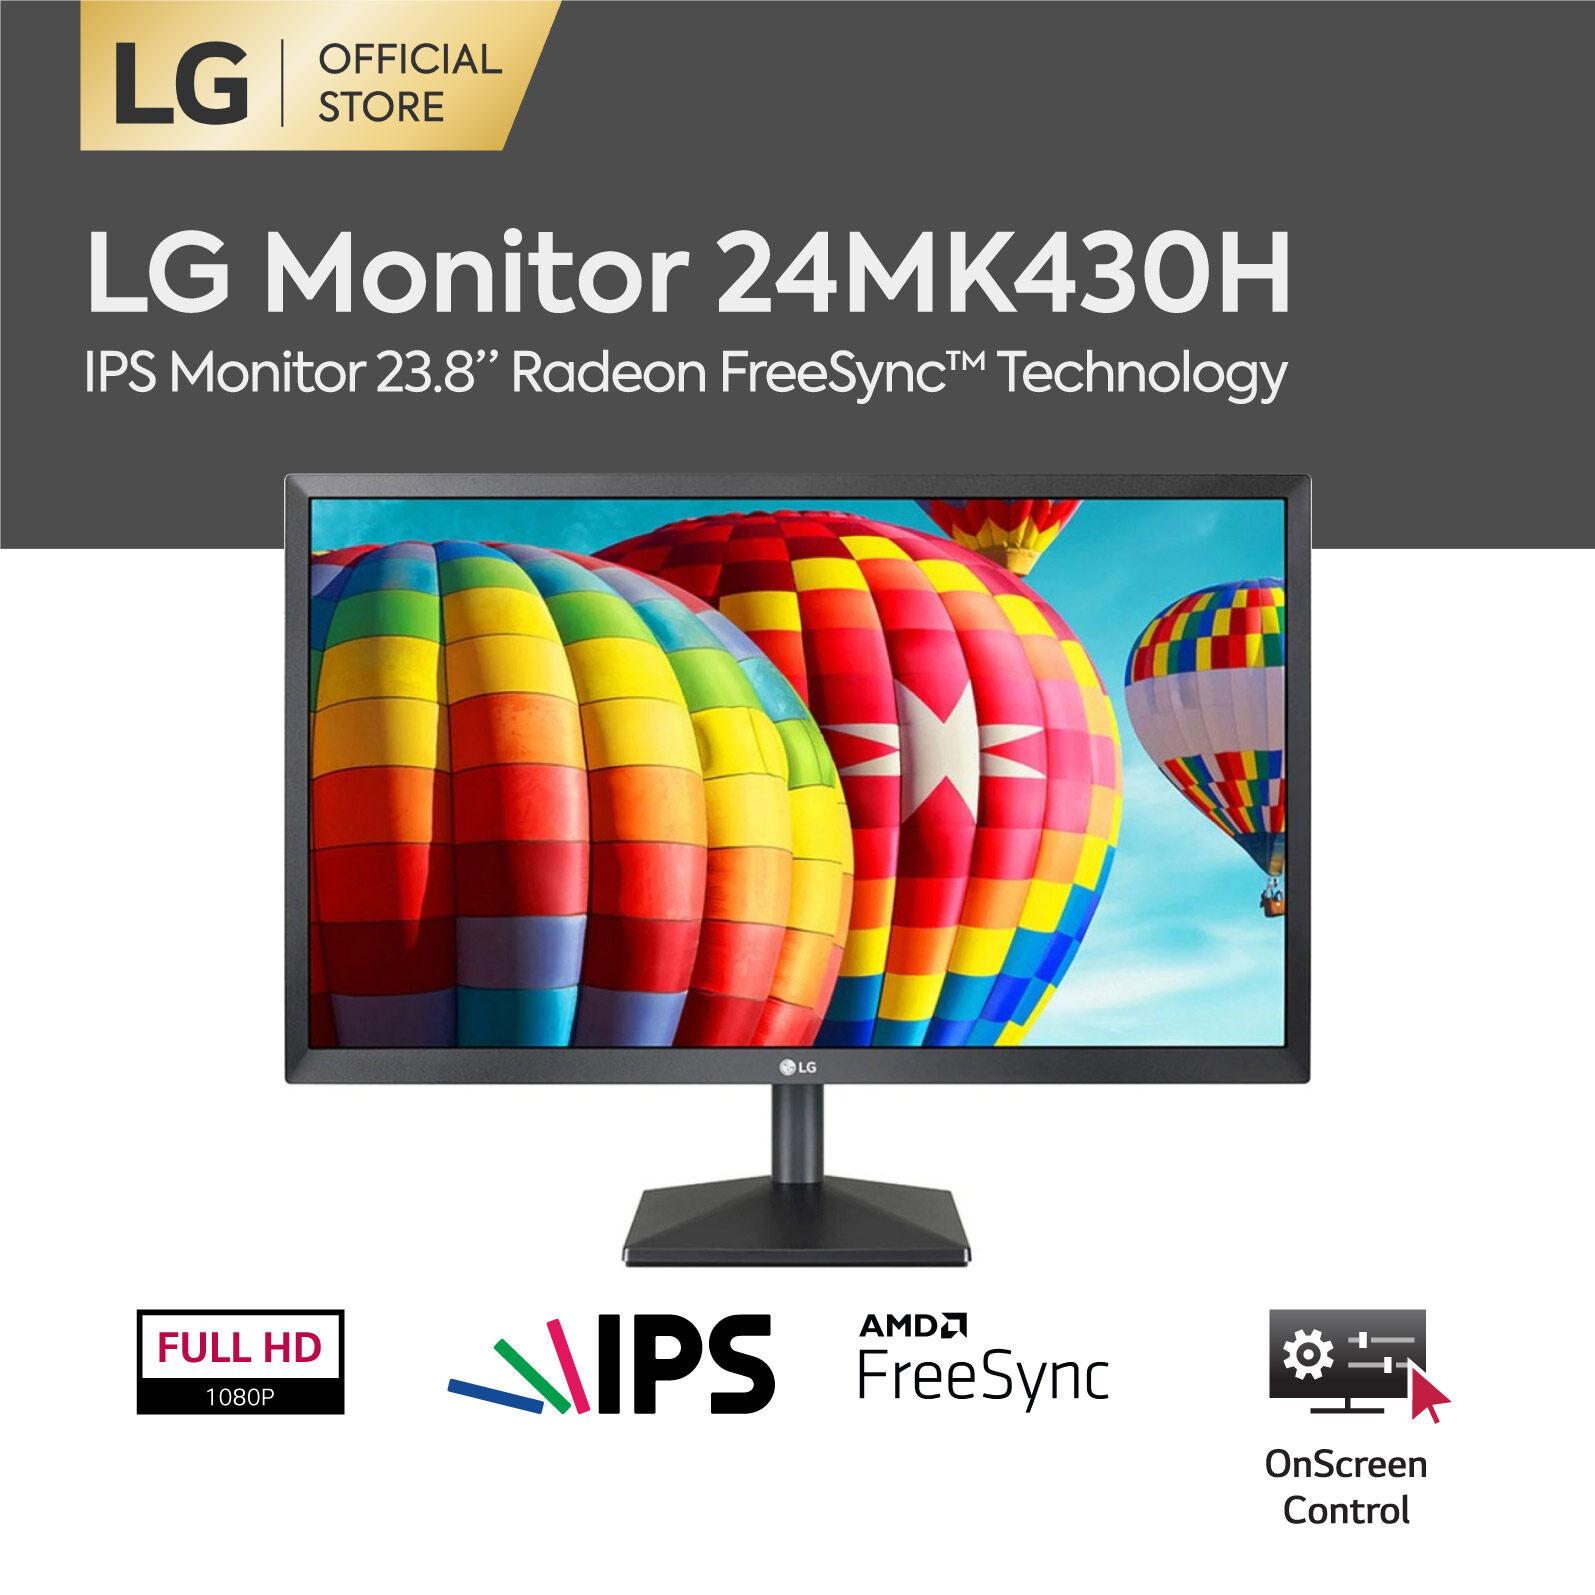 Lg จอมอนิเตอร์ ขนาด 23.8 นิ้ว รุ่น 24mk430h-B Ips Display ความละเอียด Full Hd 1920 X 1080 / 75hz / 5ms / Amd Freesync™/ Hdmi (จอคอมพิวเตอร์).